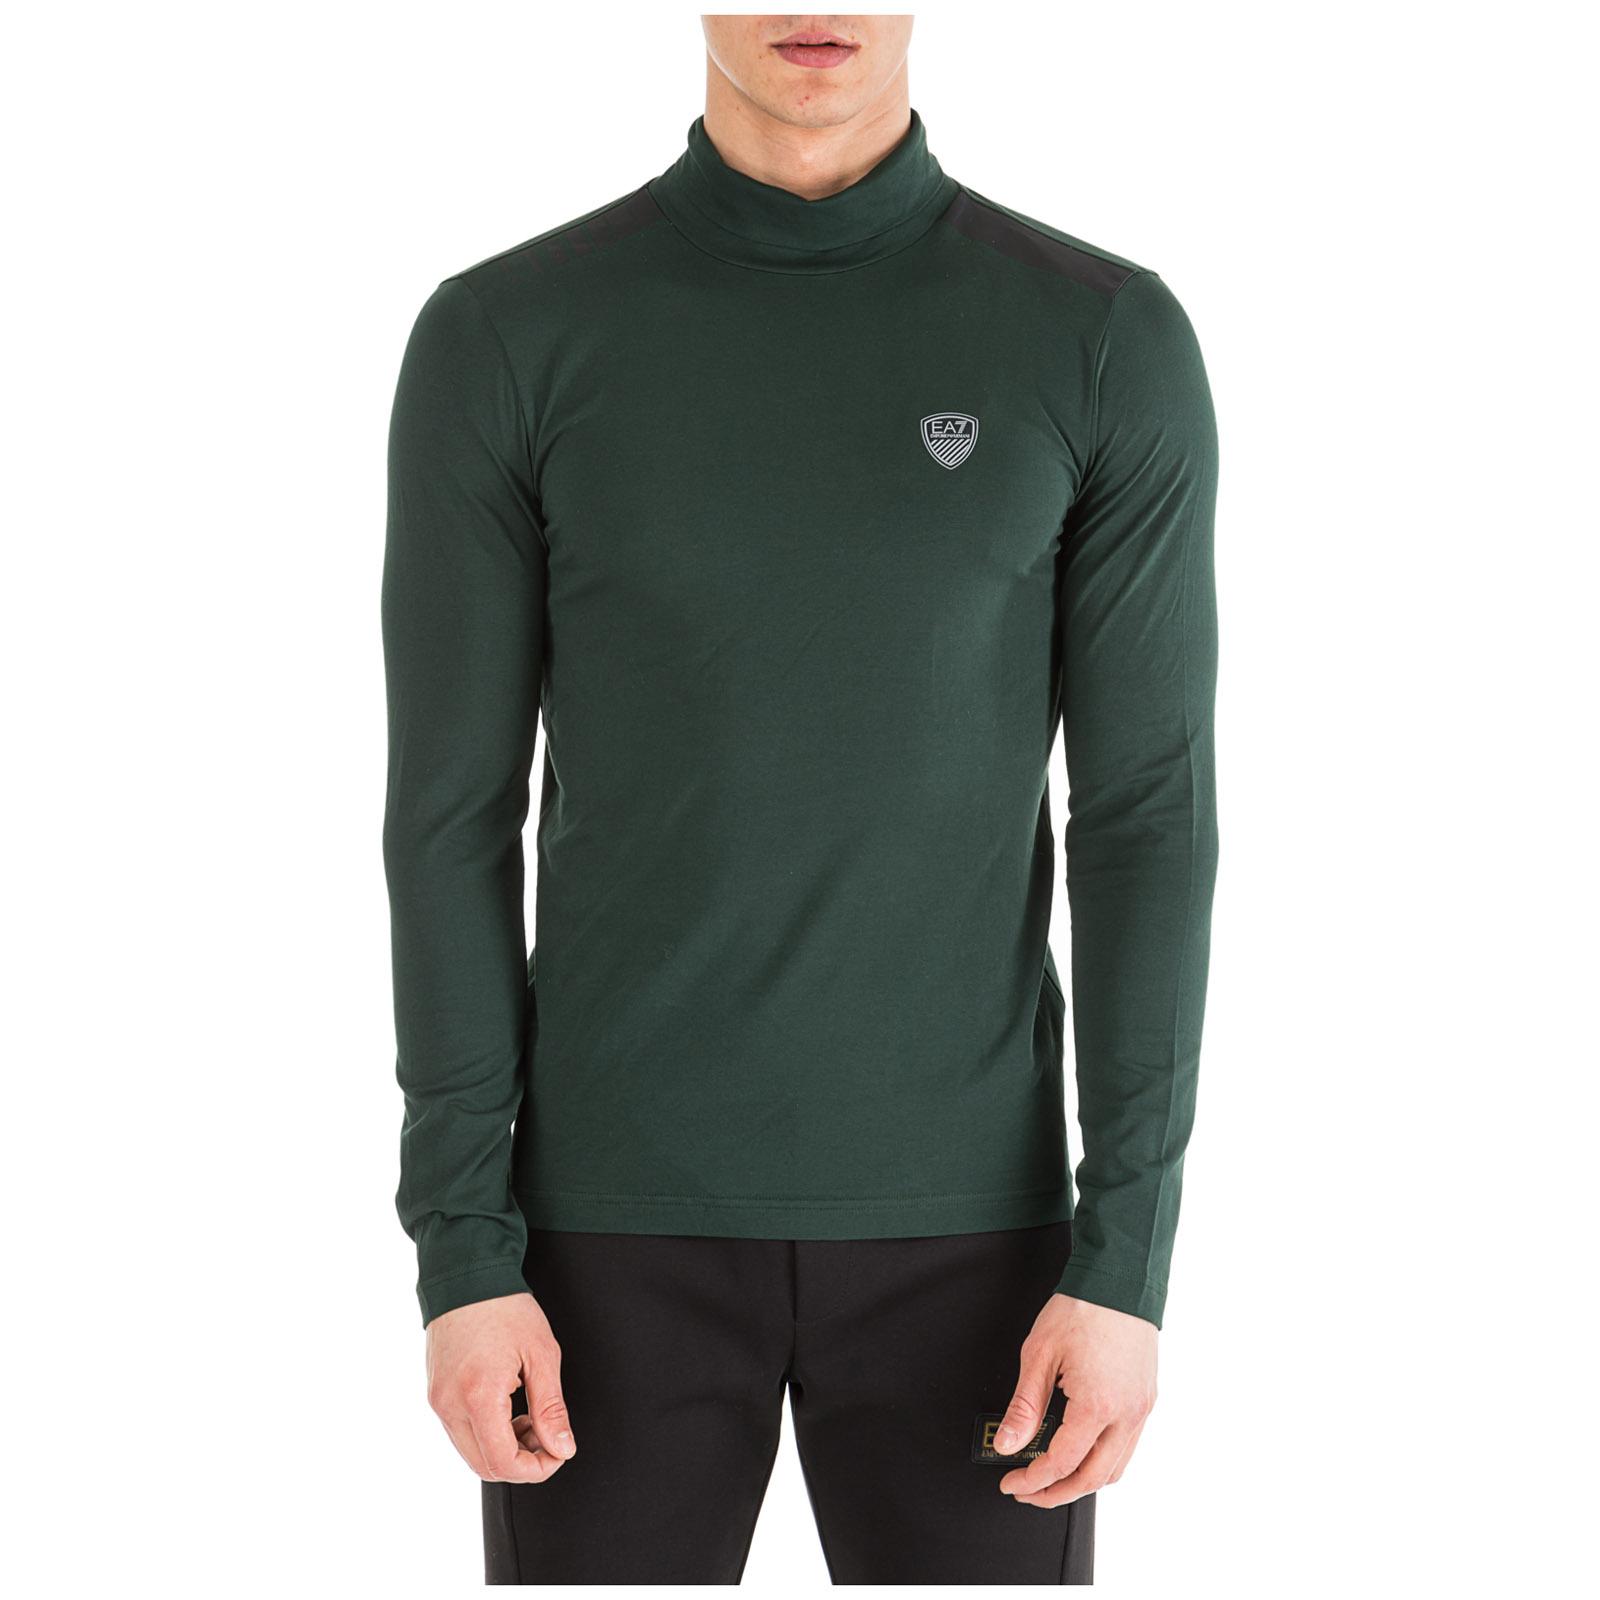 Emporio T Manica 6gpt94pjp6z1860 Armani Ea7 Verde Lunga Shirt BoedrxC